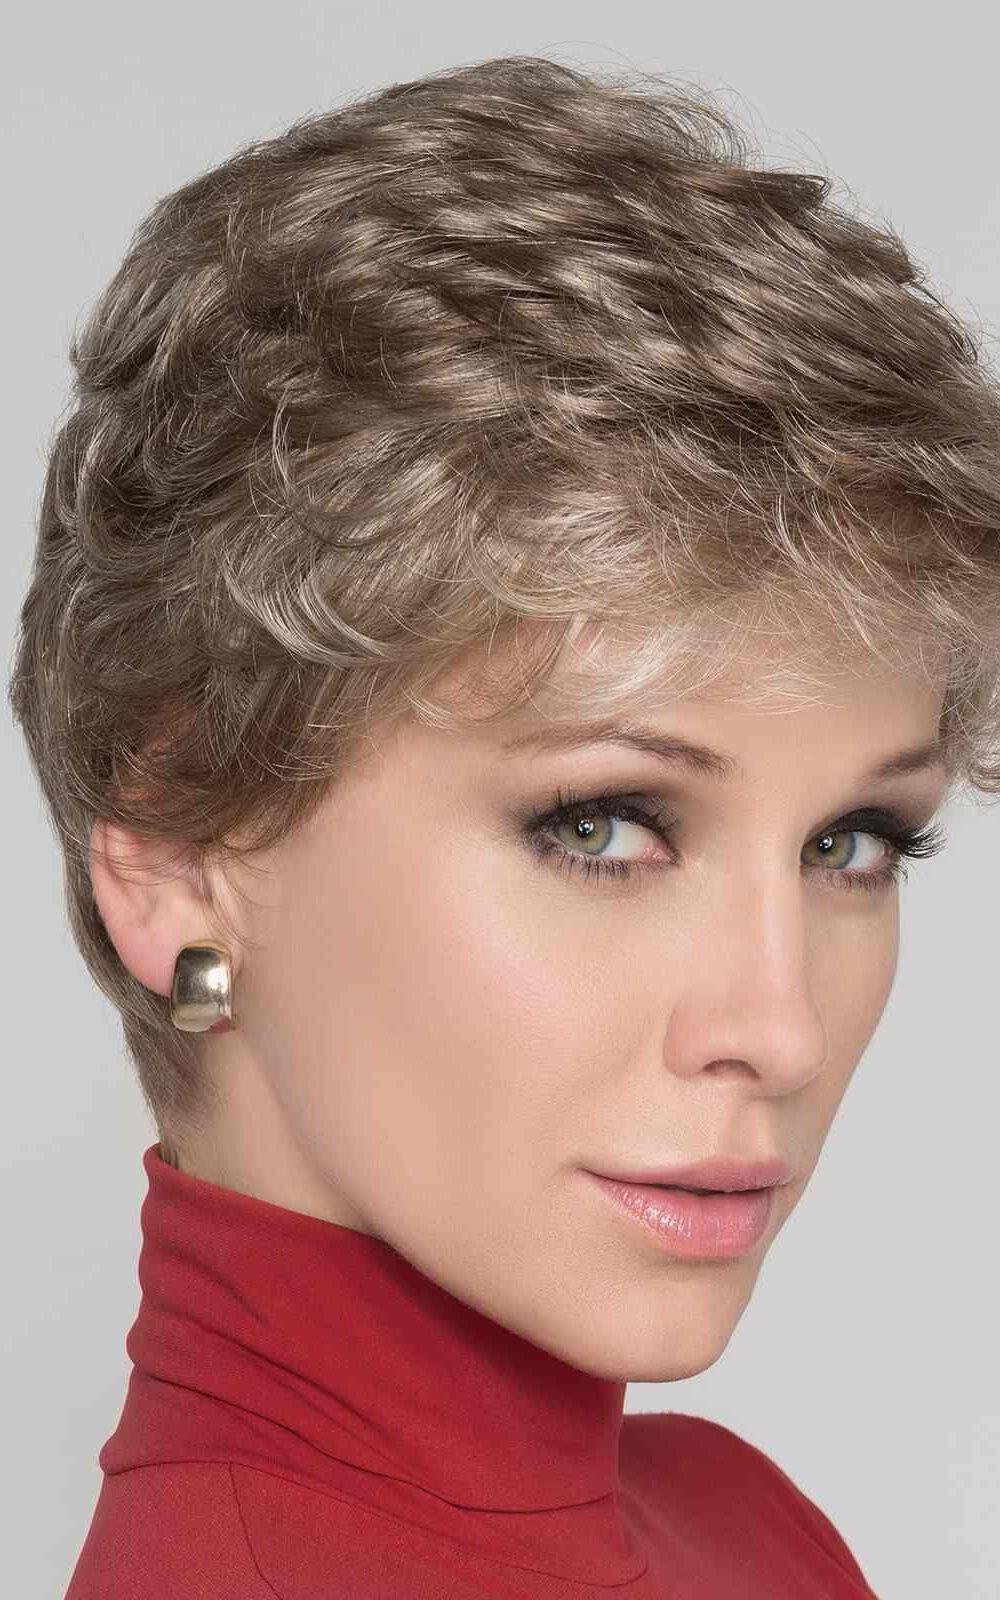 Apart Hi   Synthetic Lace Front Wig (Wefted Cap) by Ellen Wille   Sandy Blonde Mix   Elly-K.com.au